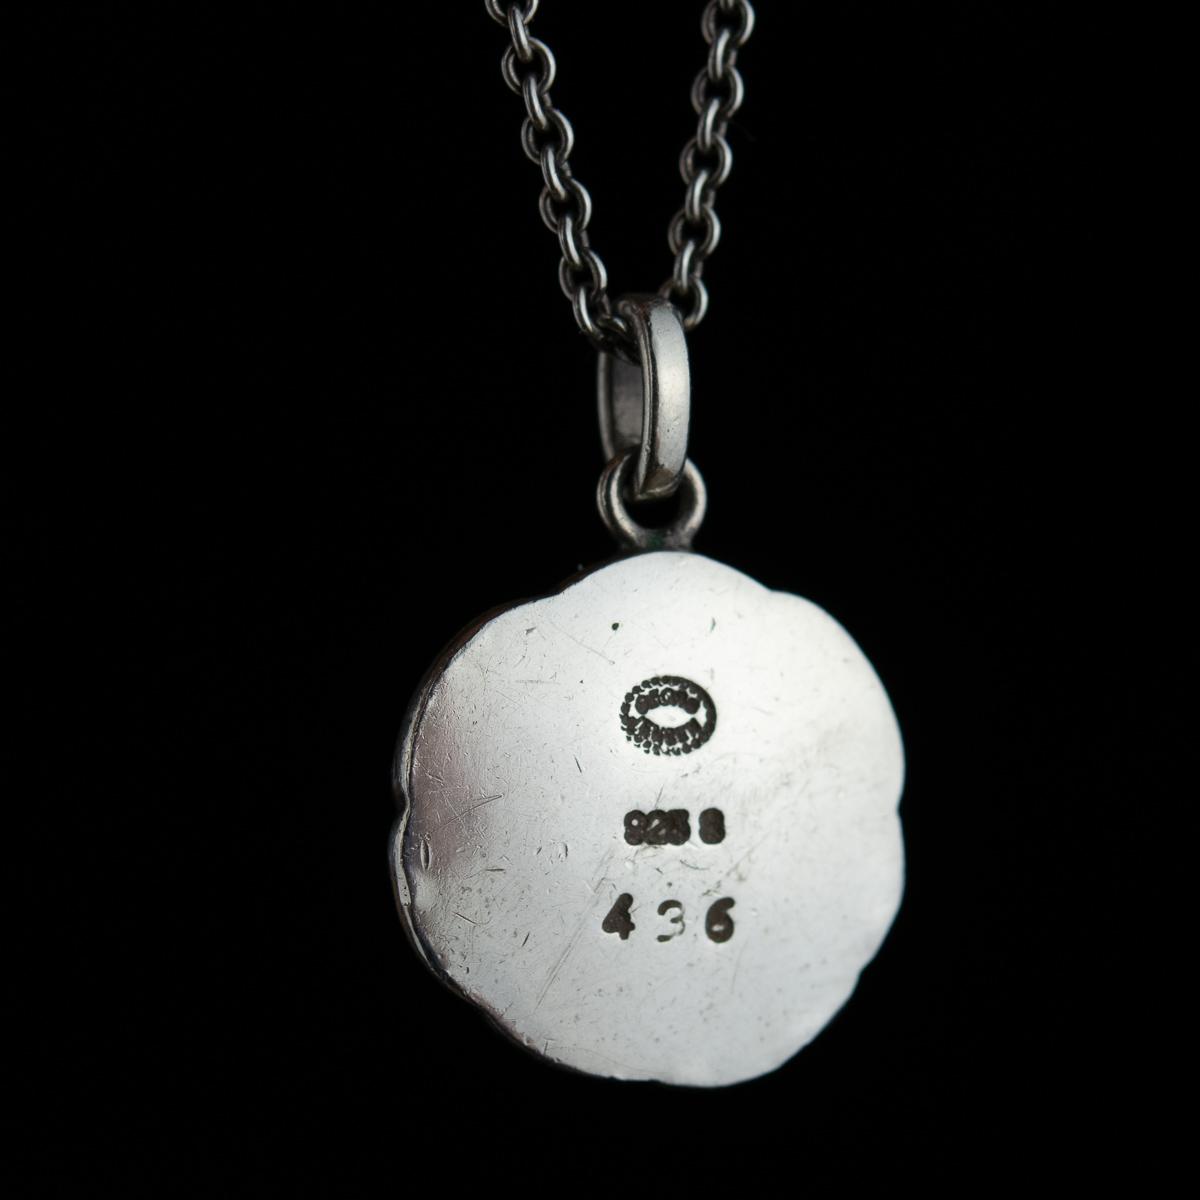 DFNL0025 Sterling Silver Necklace